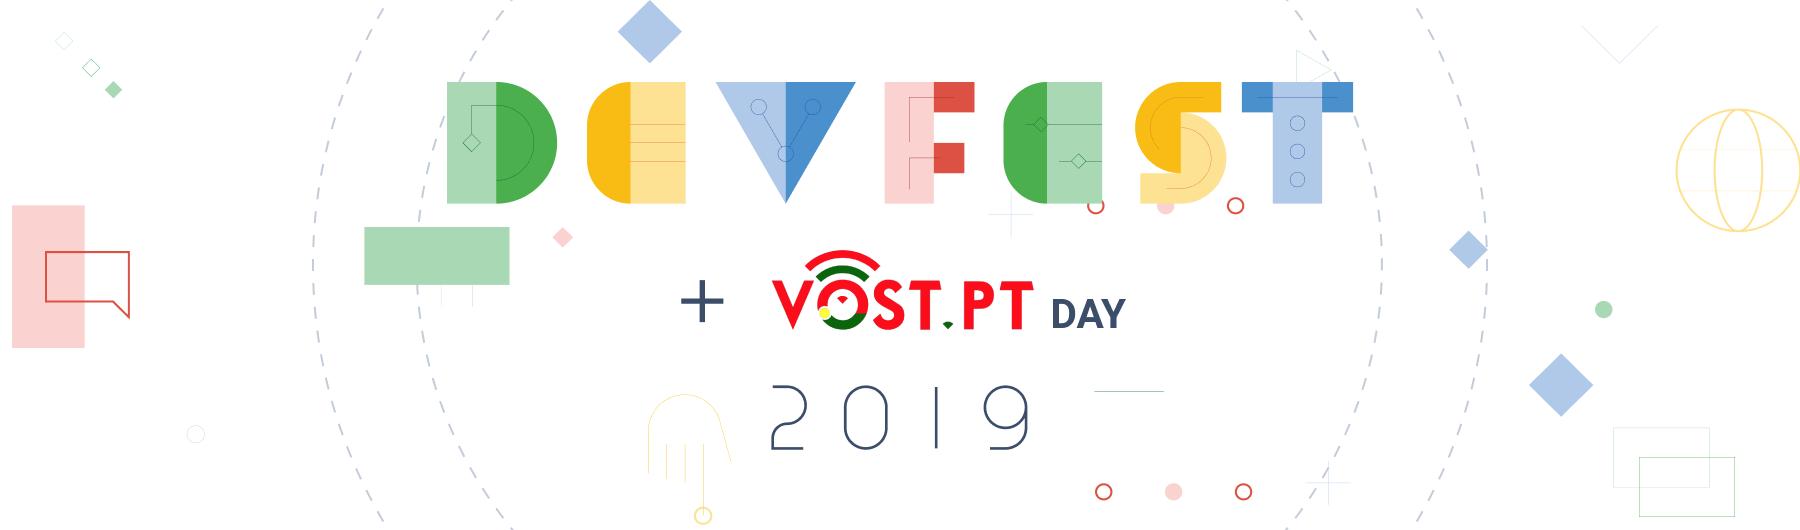 GDG Devfest19 Lisbon + VOST Day